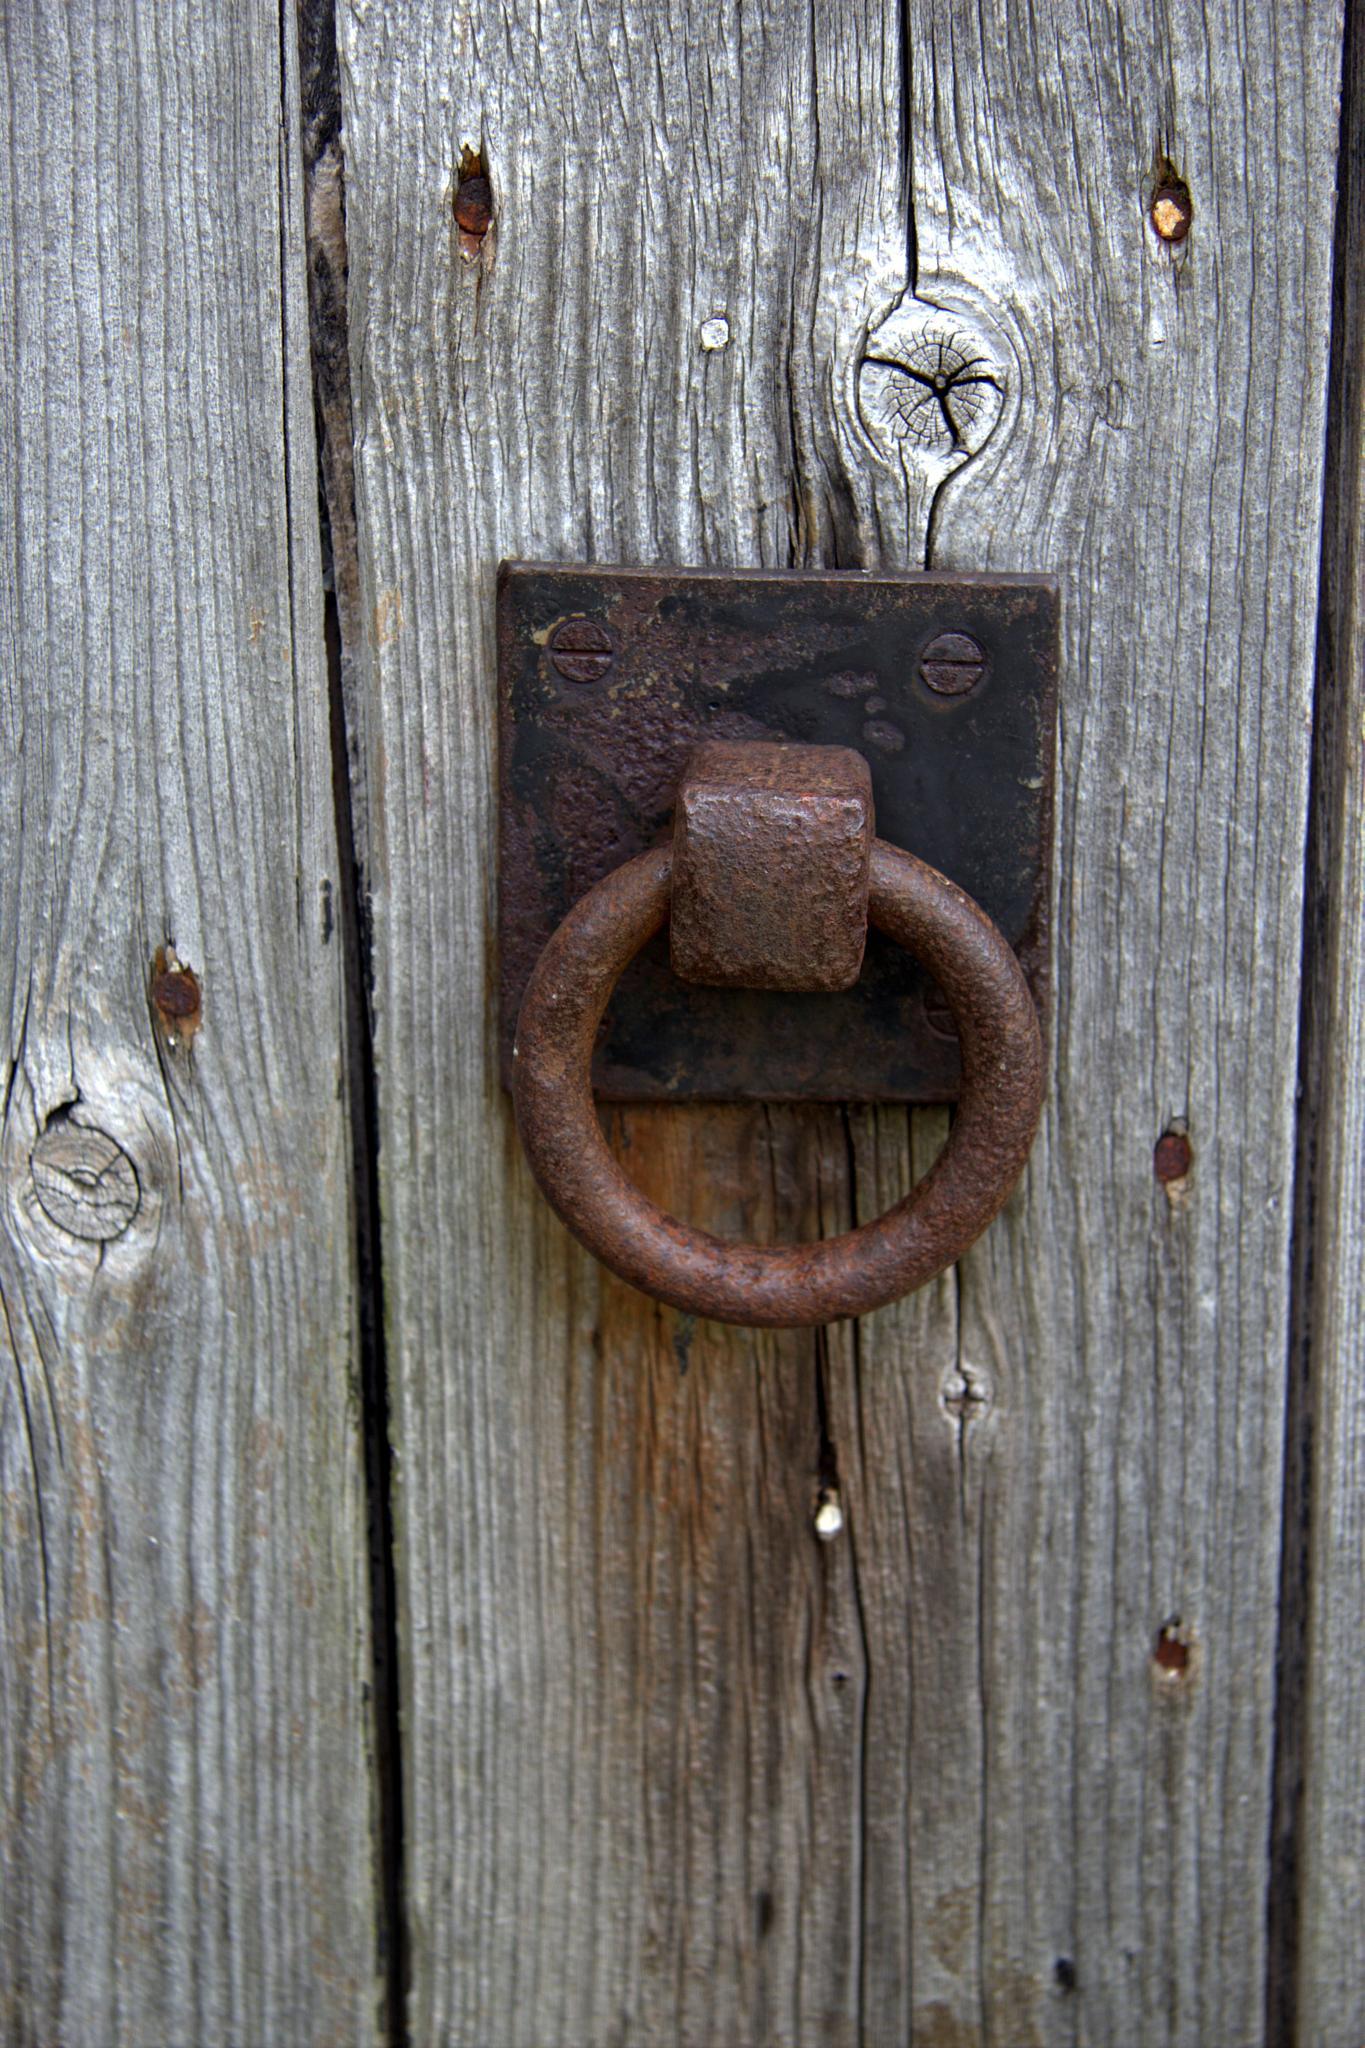 door knob by lison Townley